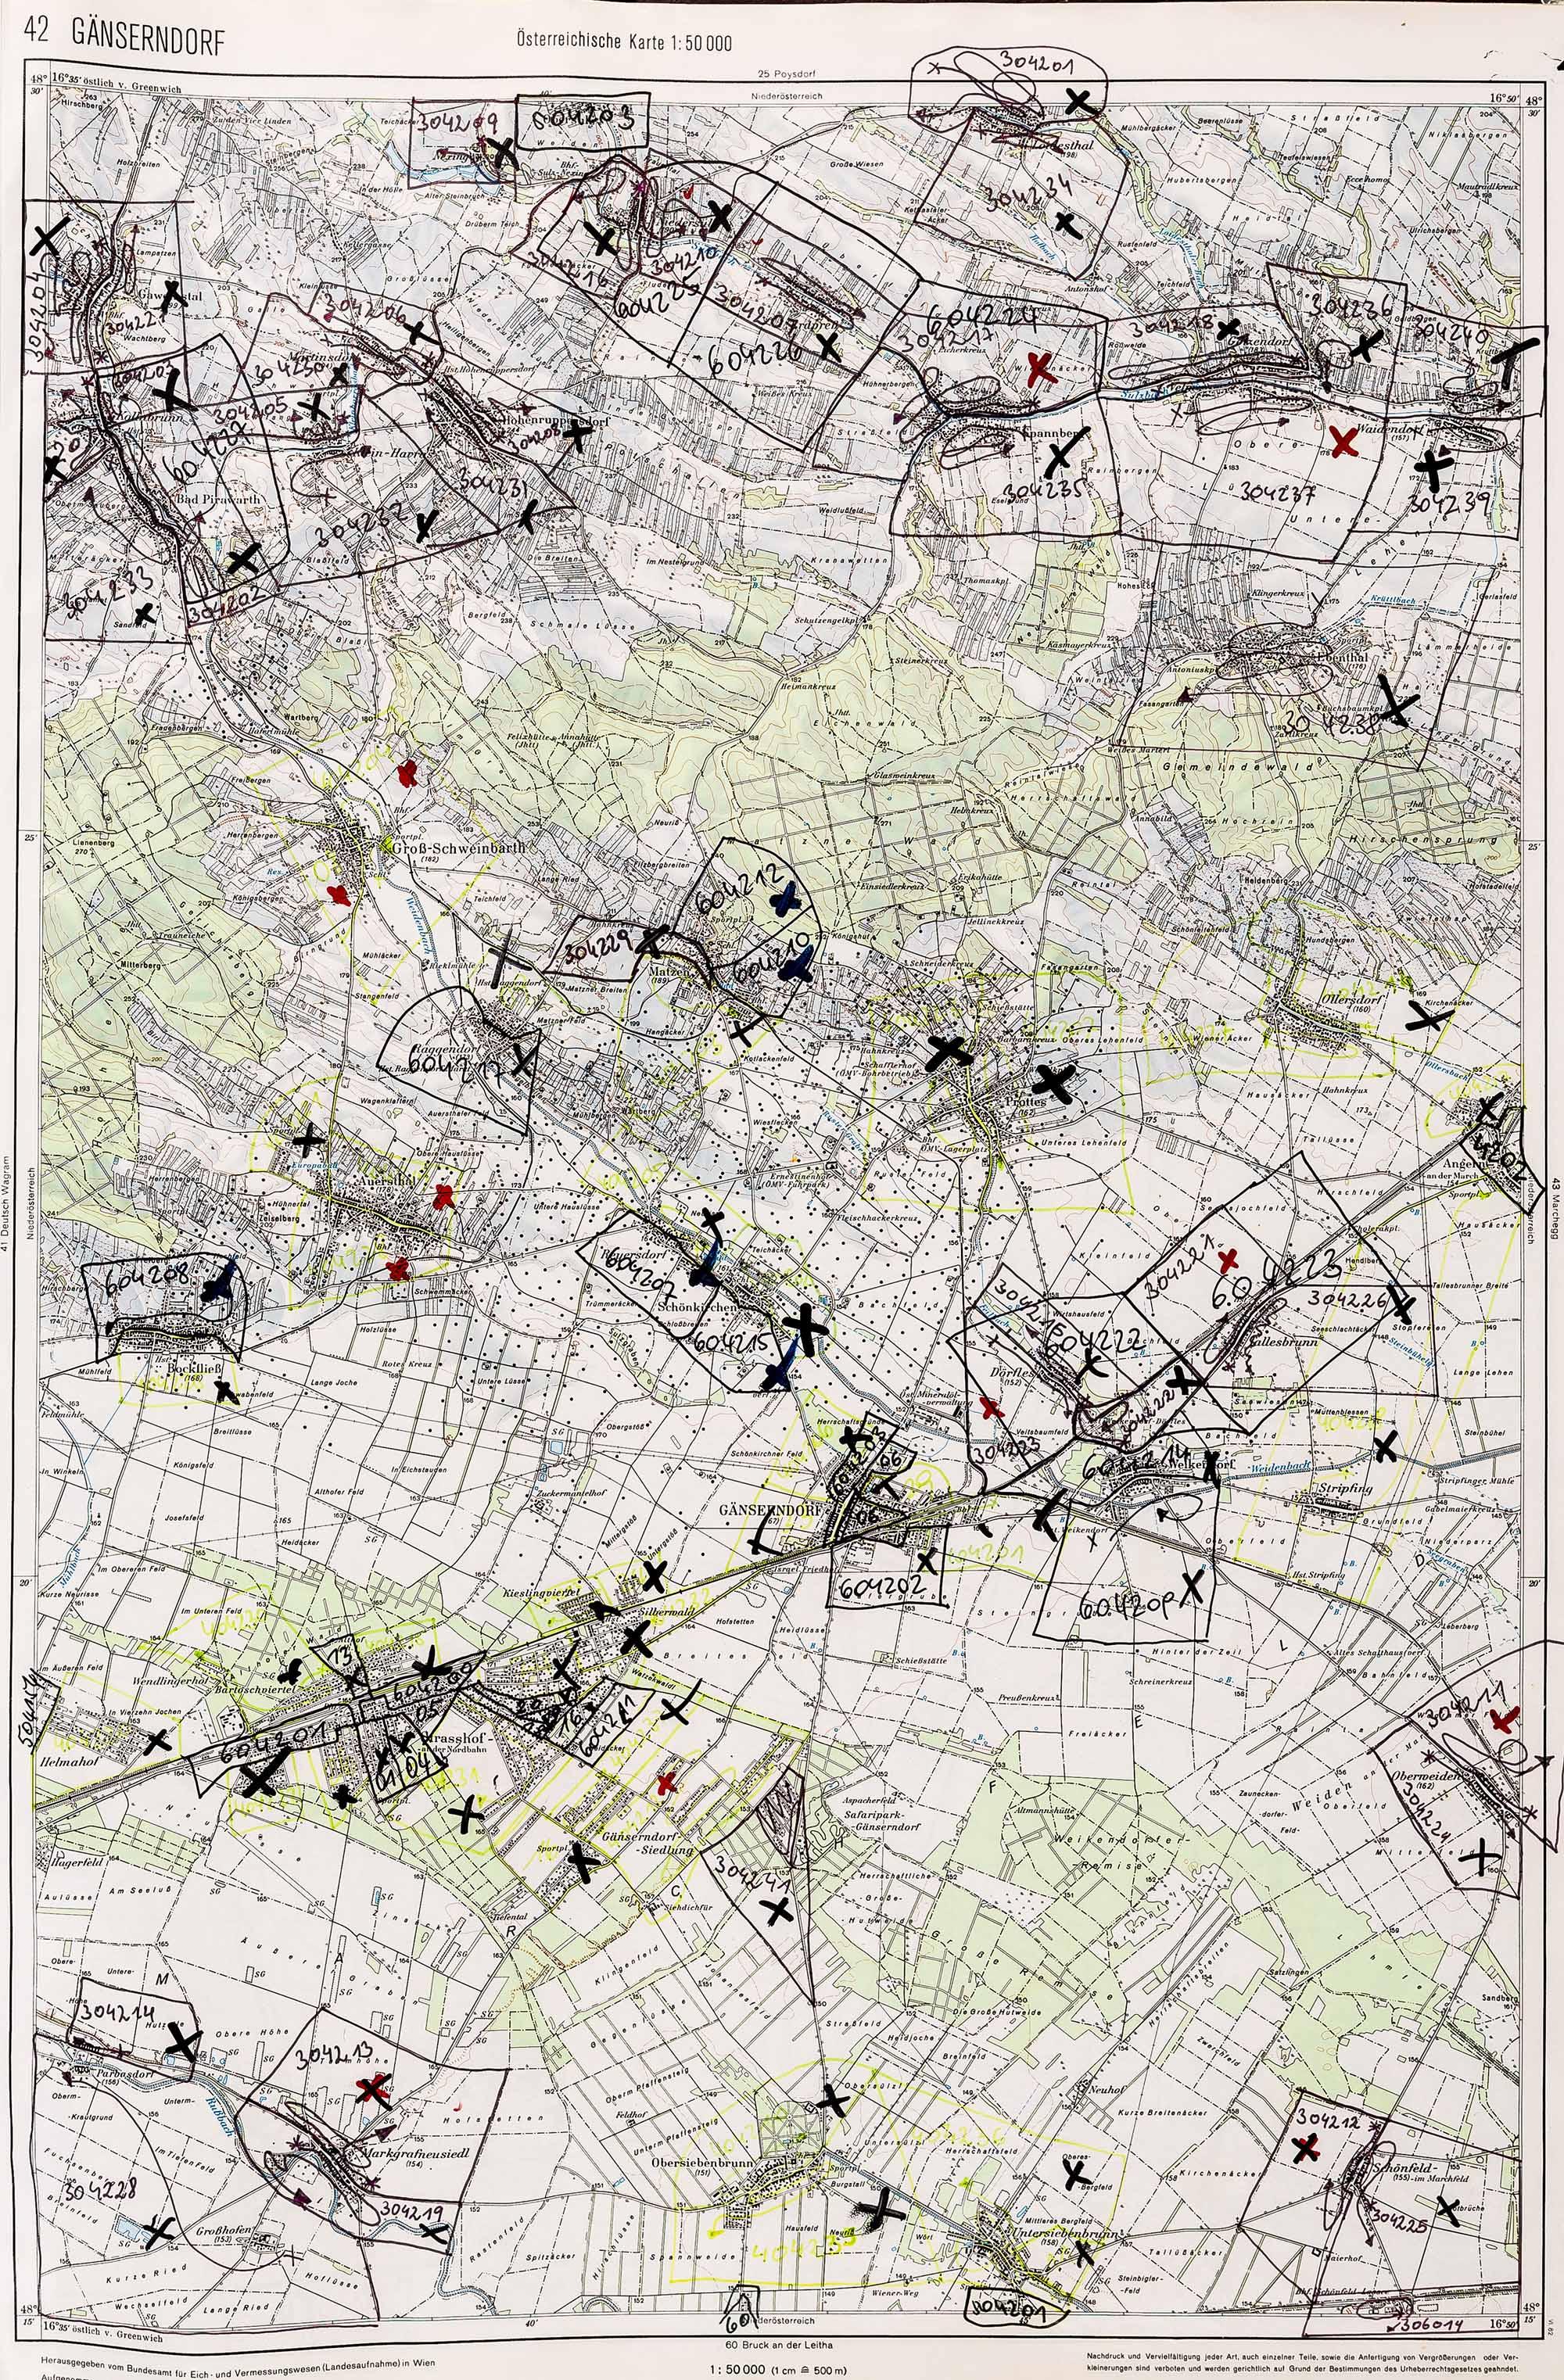 1983-1986 Karte 042